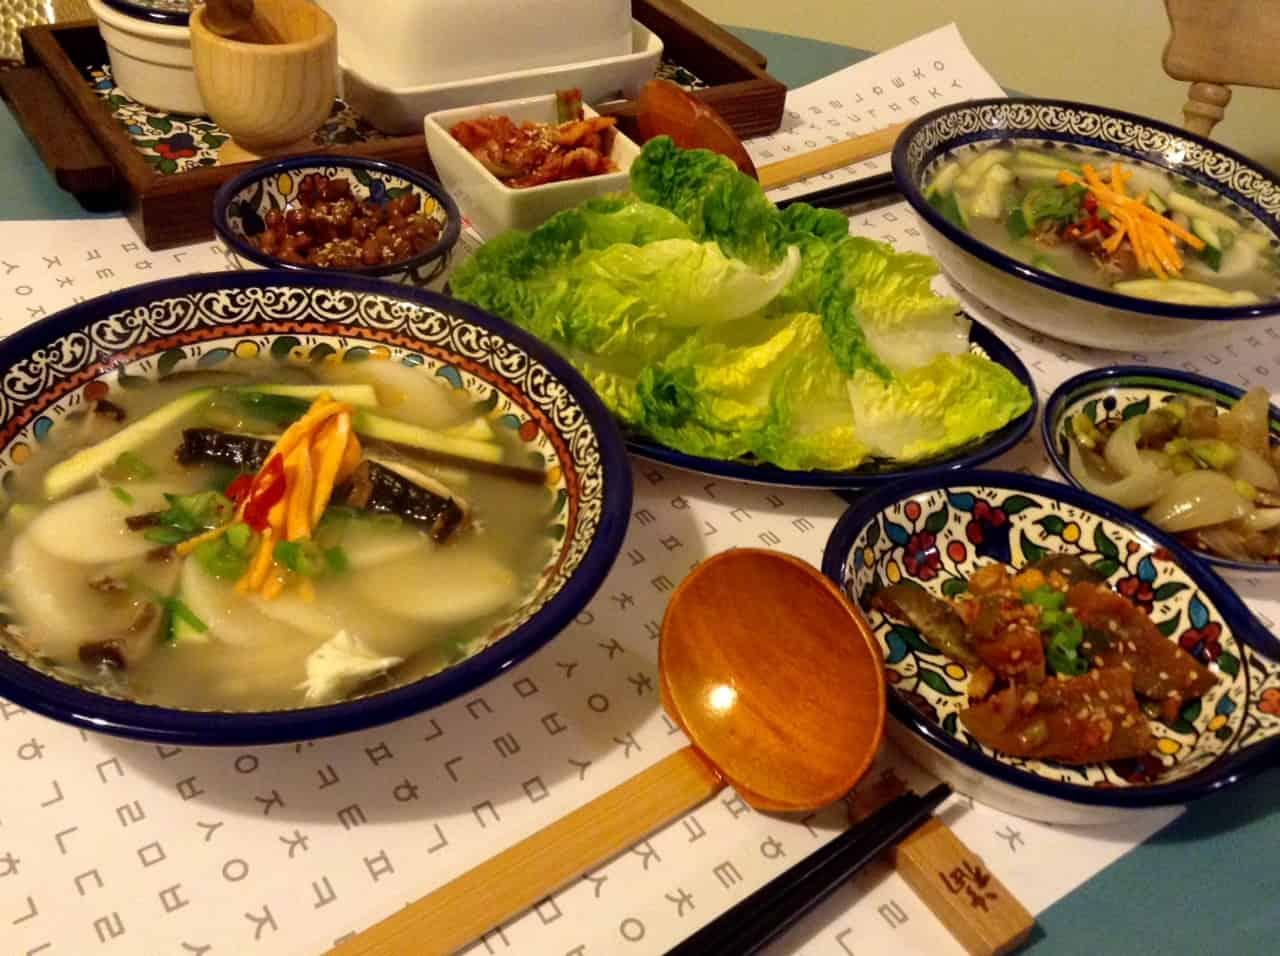 Korean dinner & korean table setting - Cooking Korean food with Maangchi